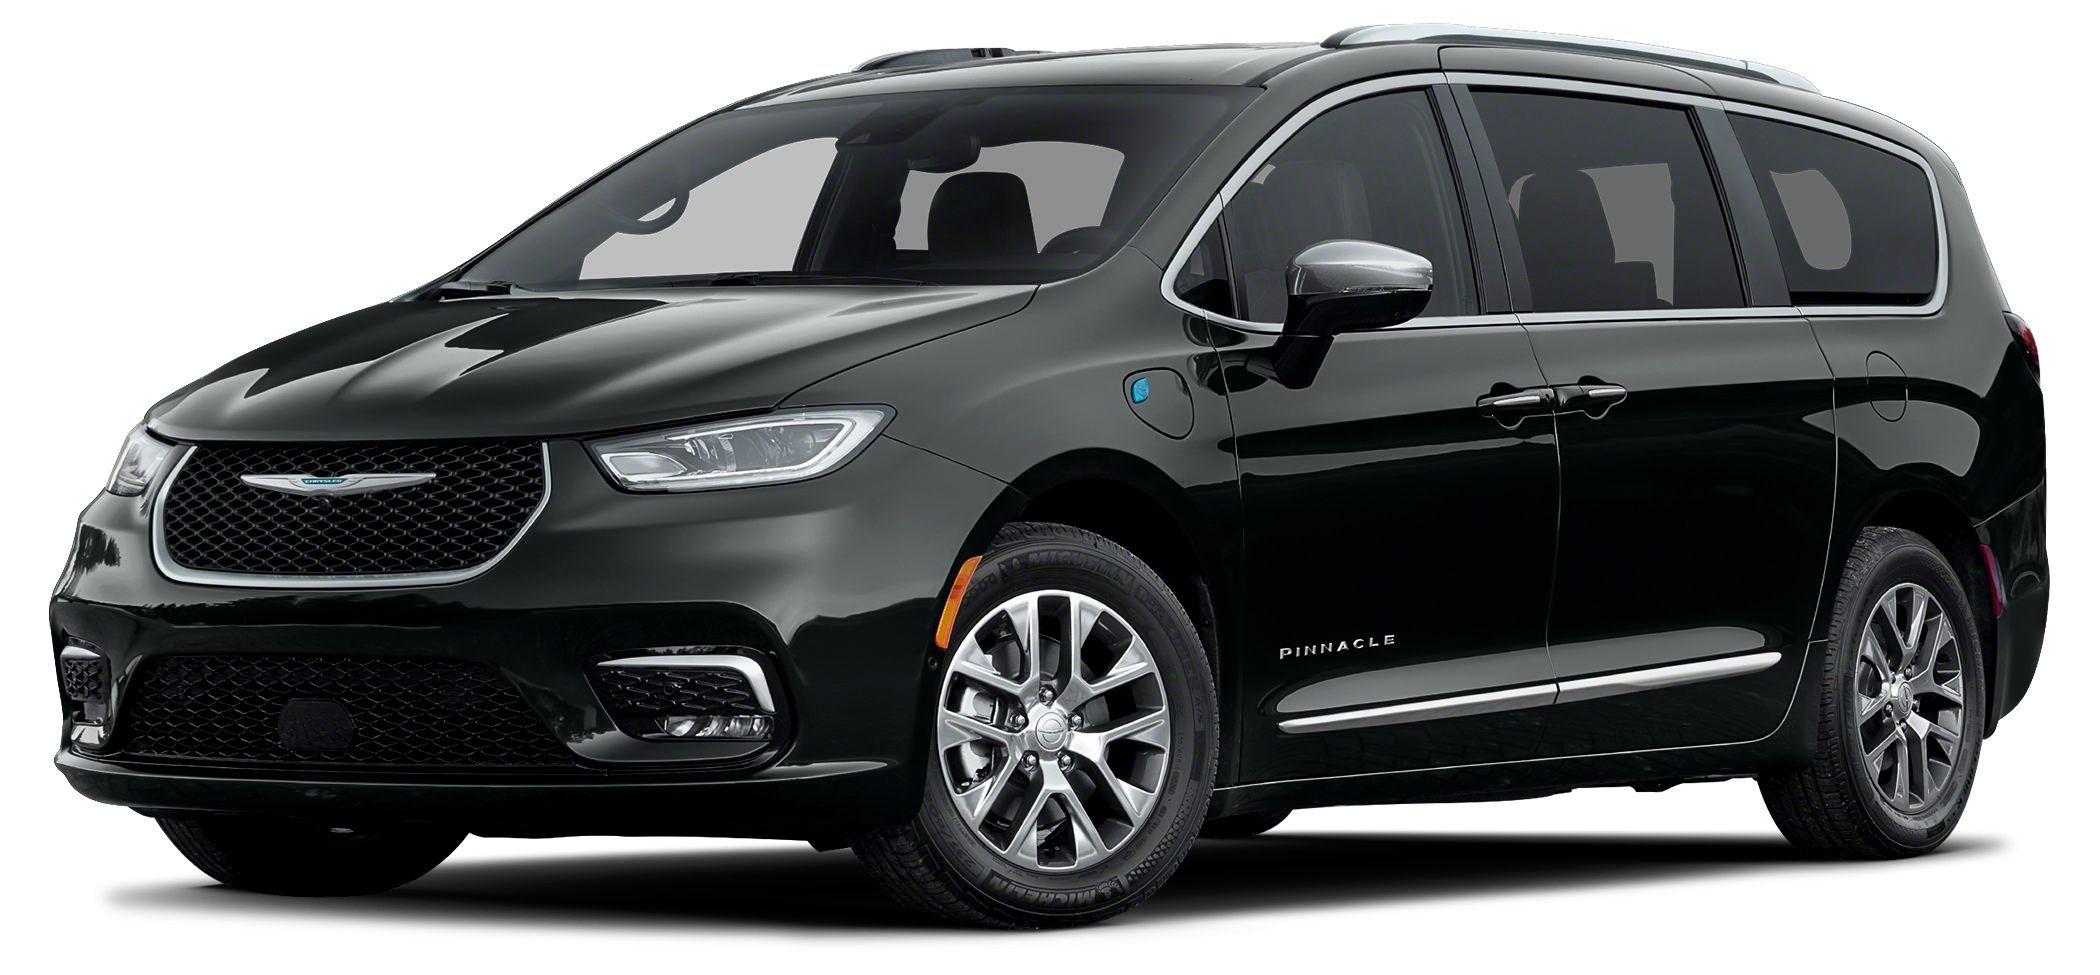 Image 2021 Chrysler Pacifica hybrid Touring L